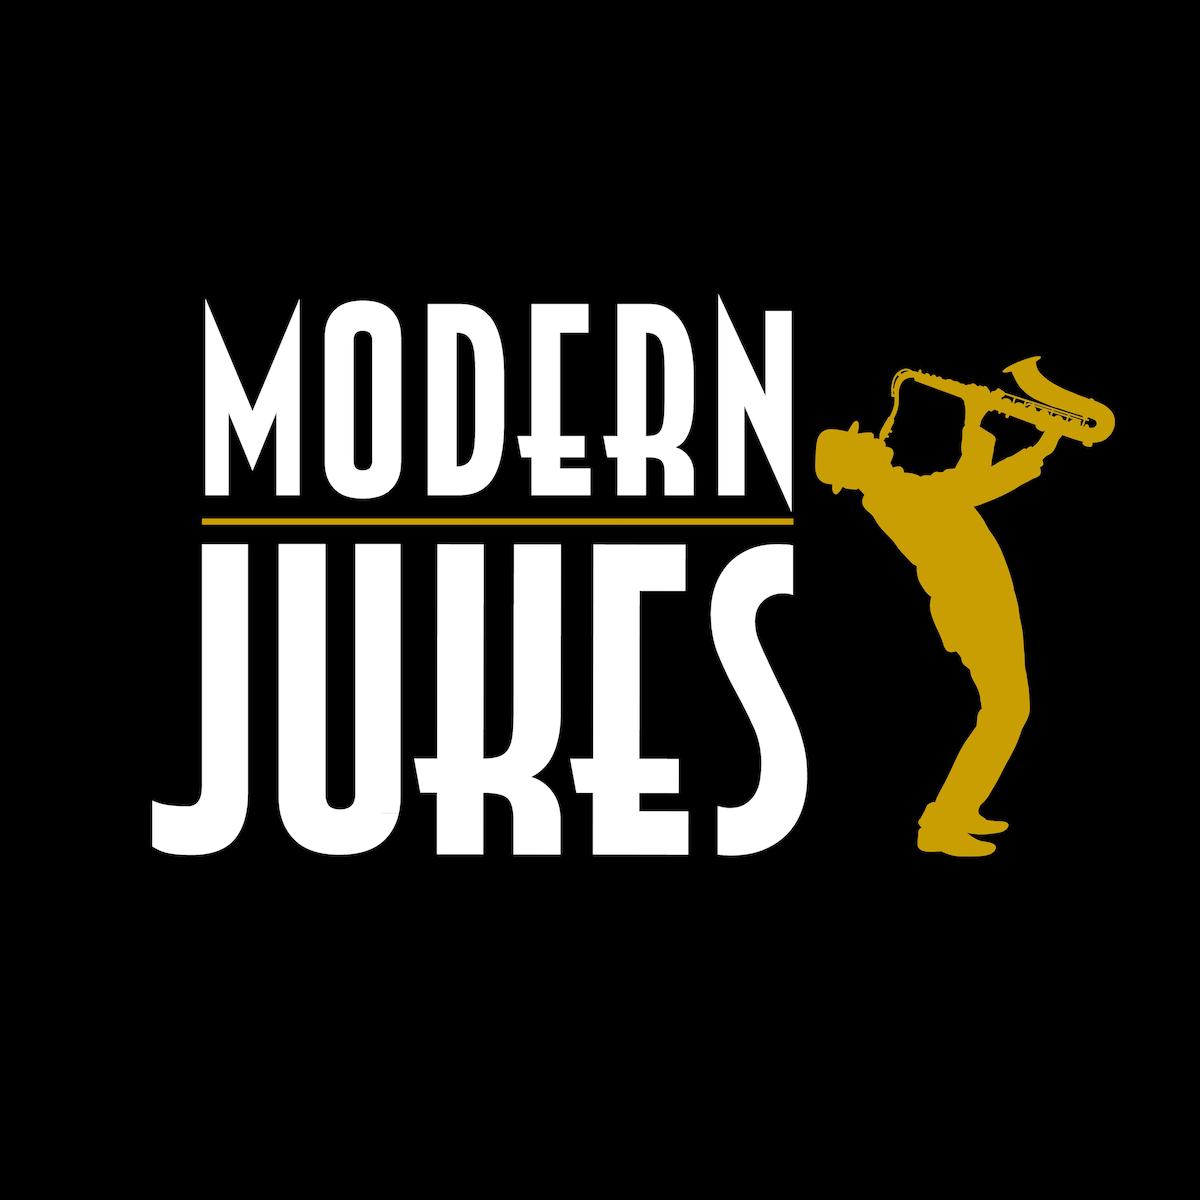 Modern-Jukes